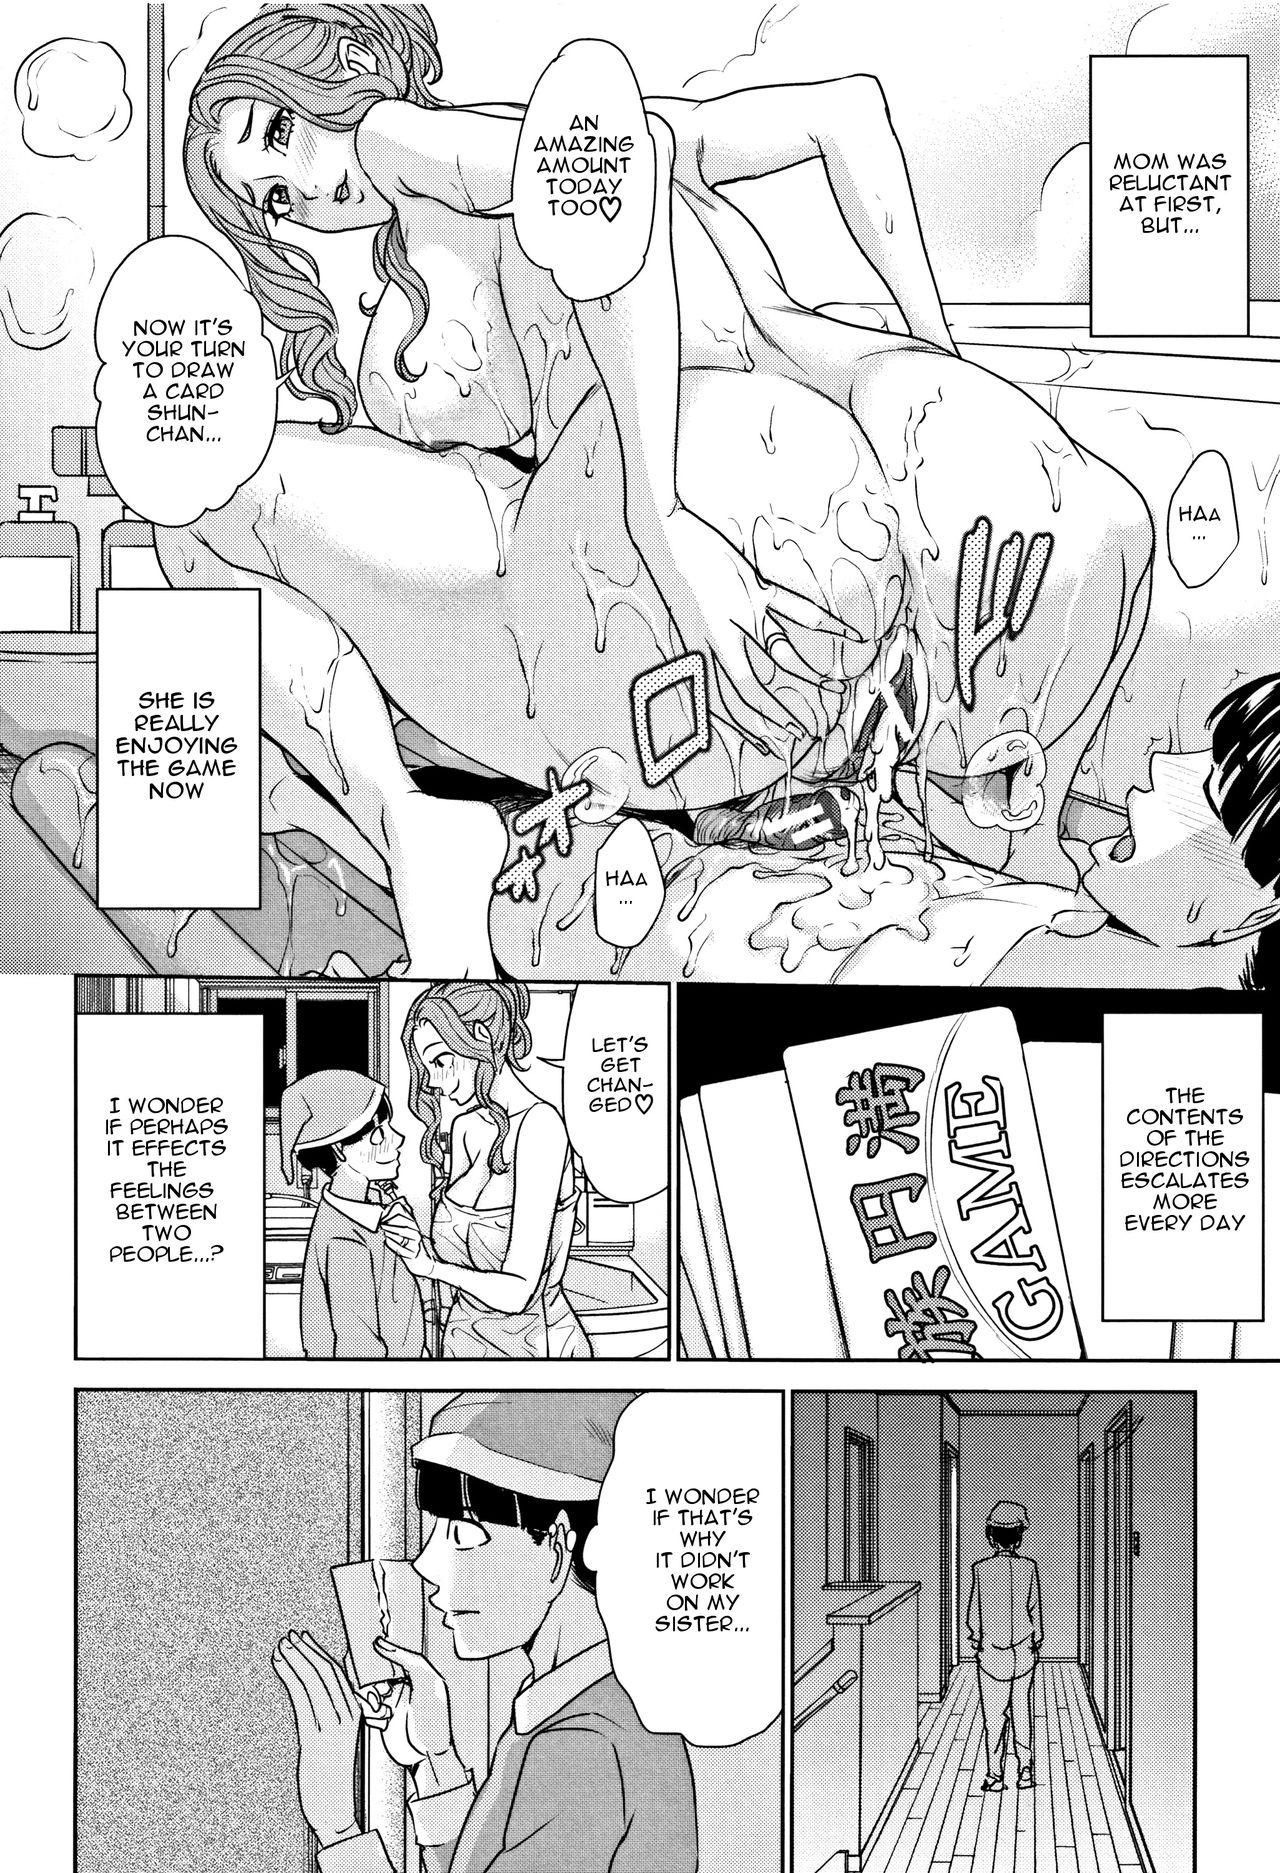 [Maimu-Maimu] Kazoku Soukan Game - family Incest game Ch. 1-3 [English] [Januz] 40